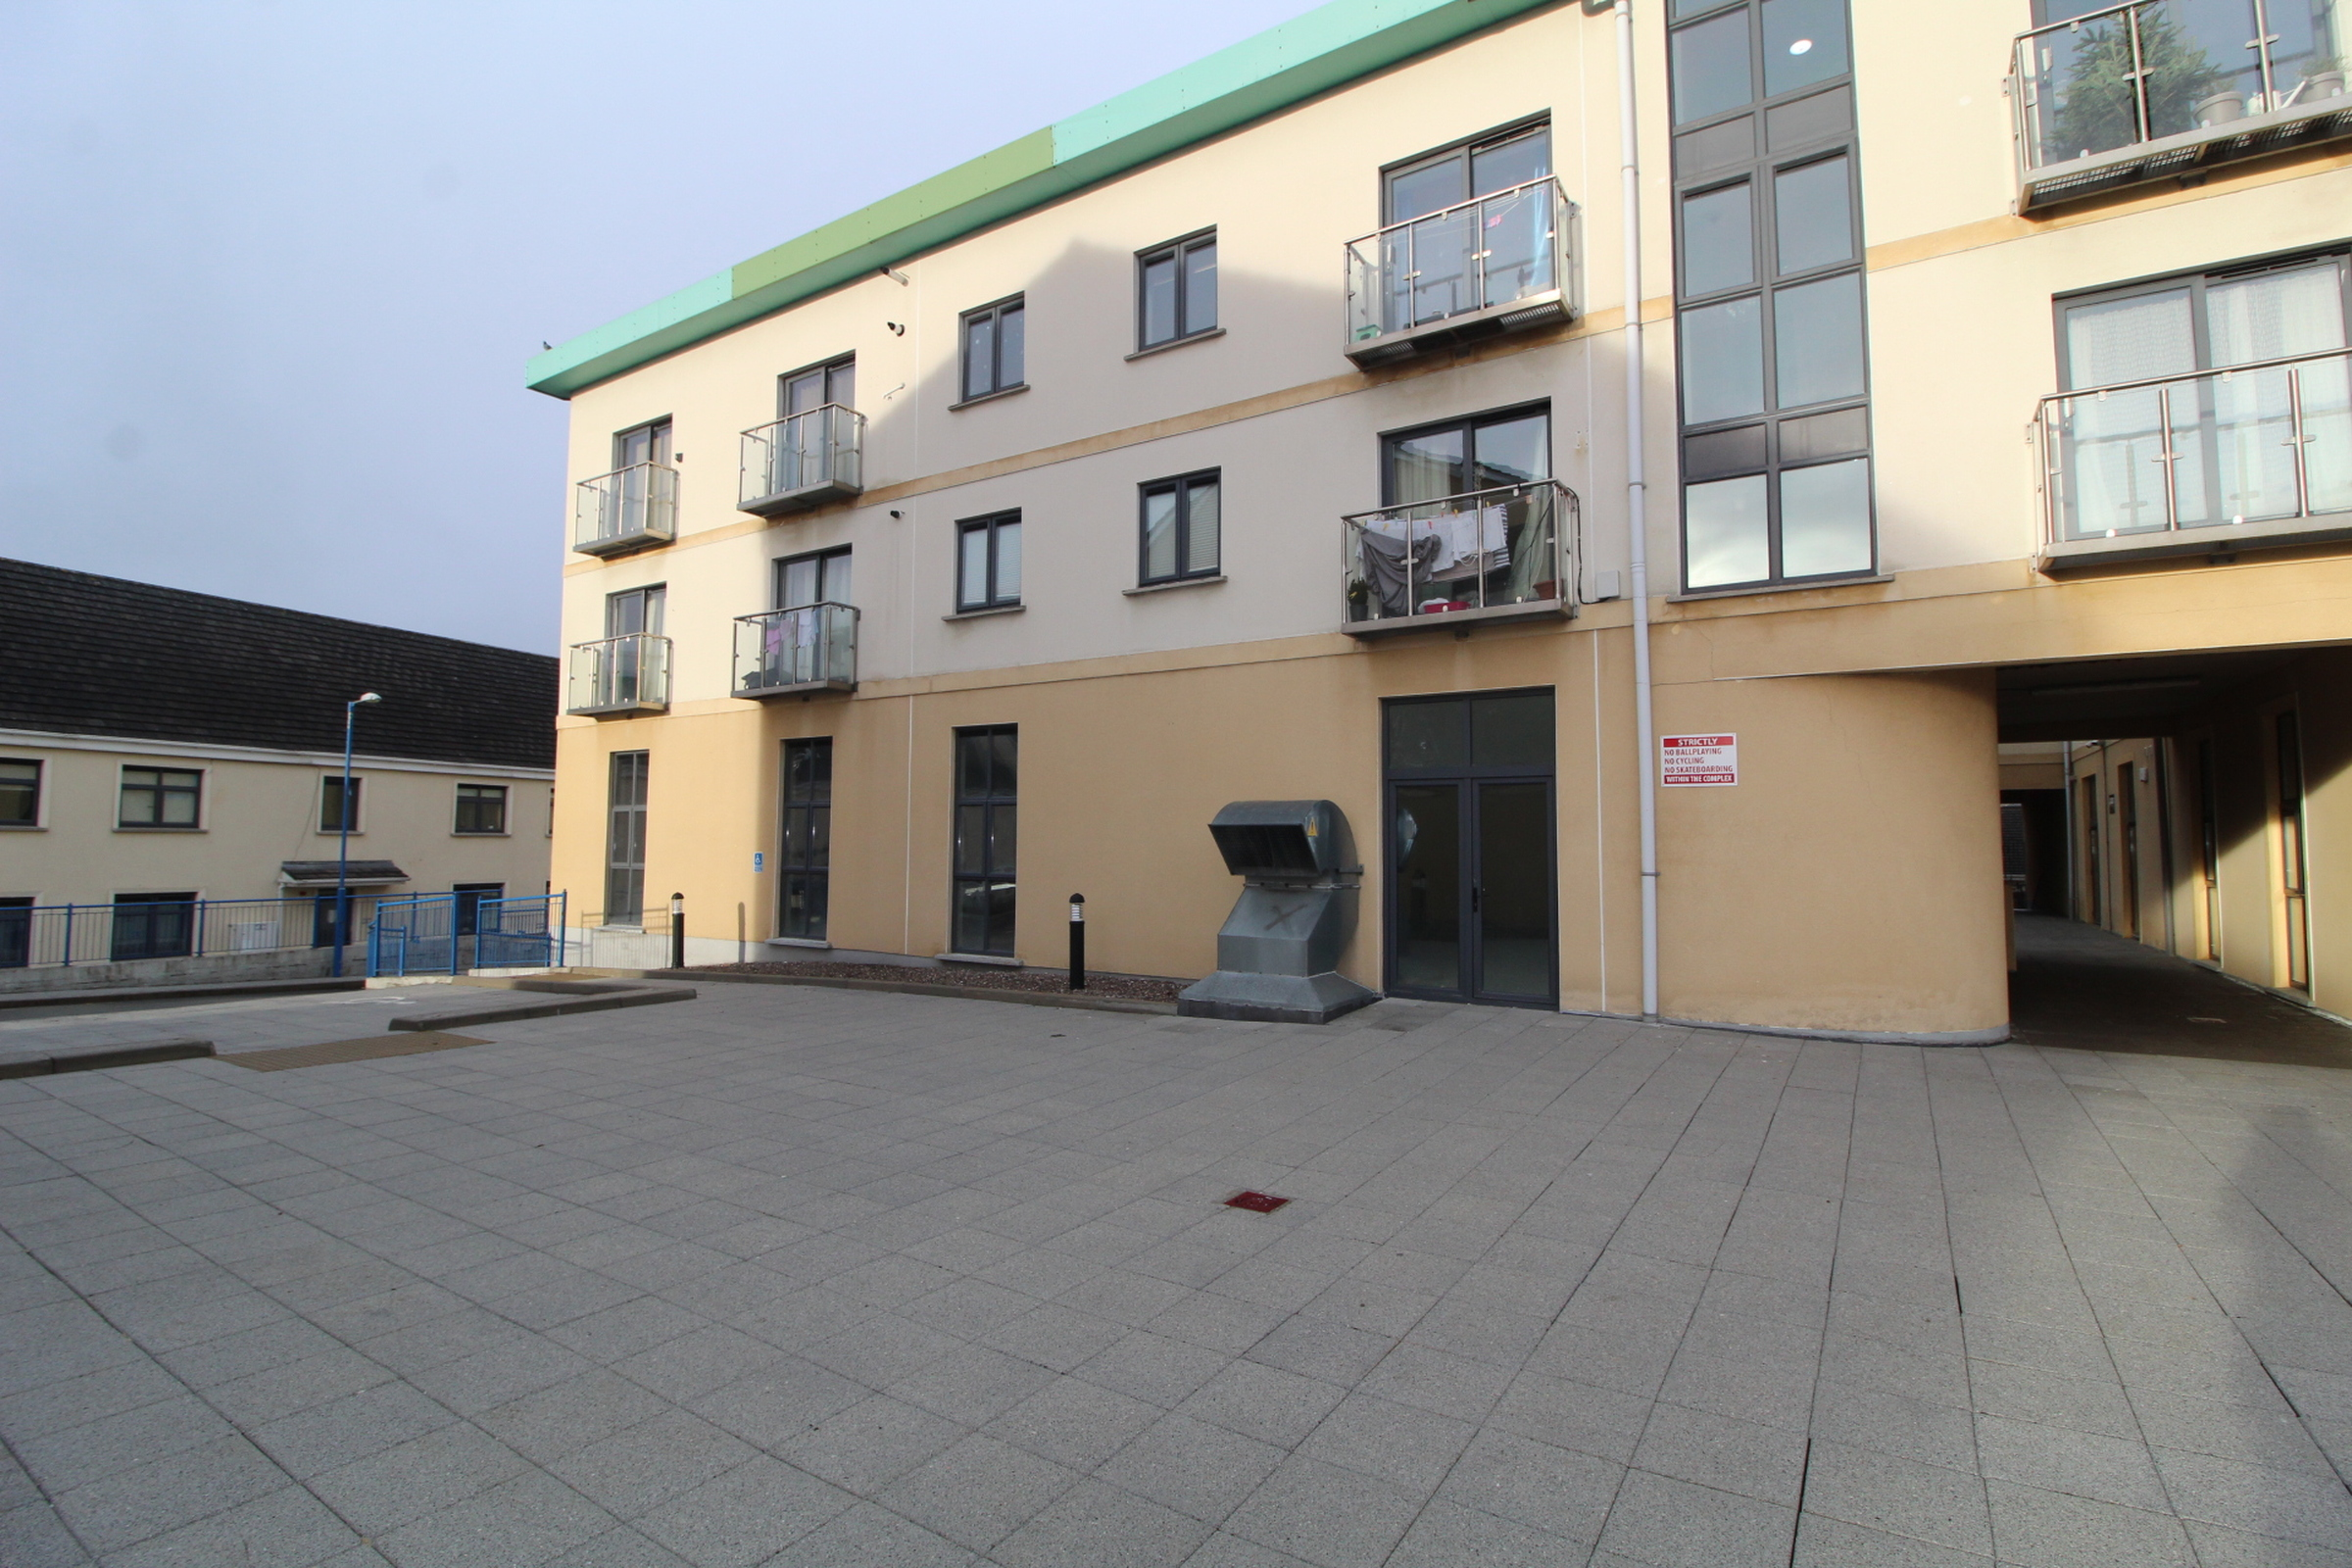 Unit 4, Fairgreen, Mallow, Co. Cork